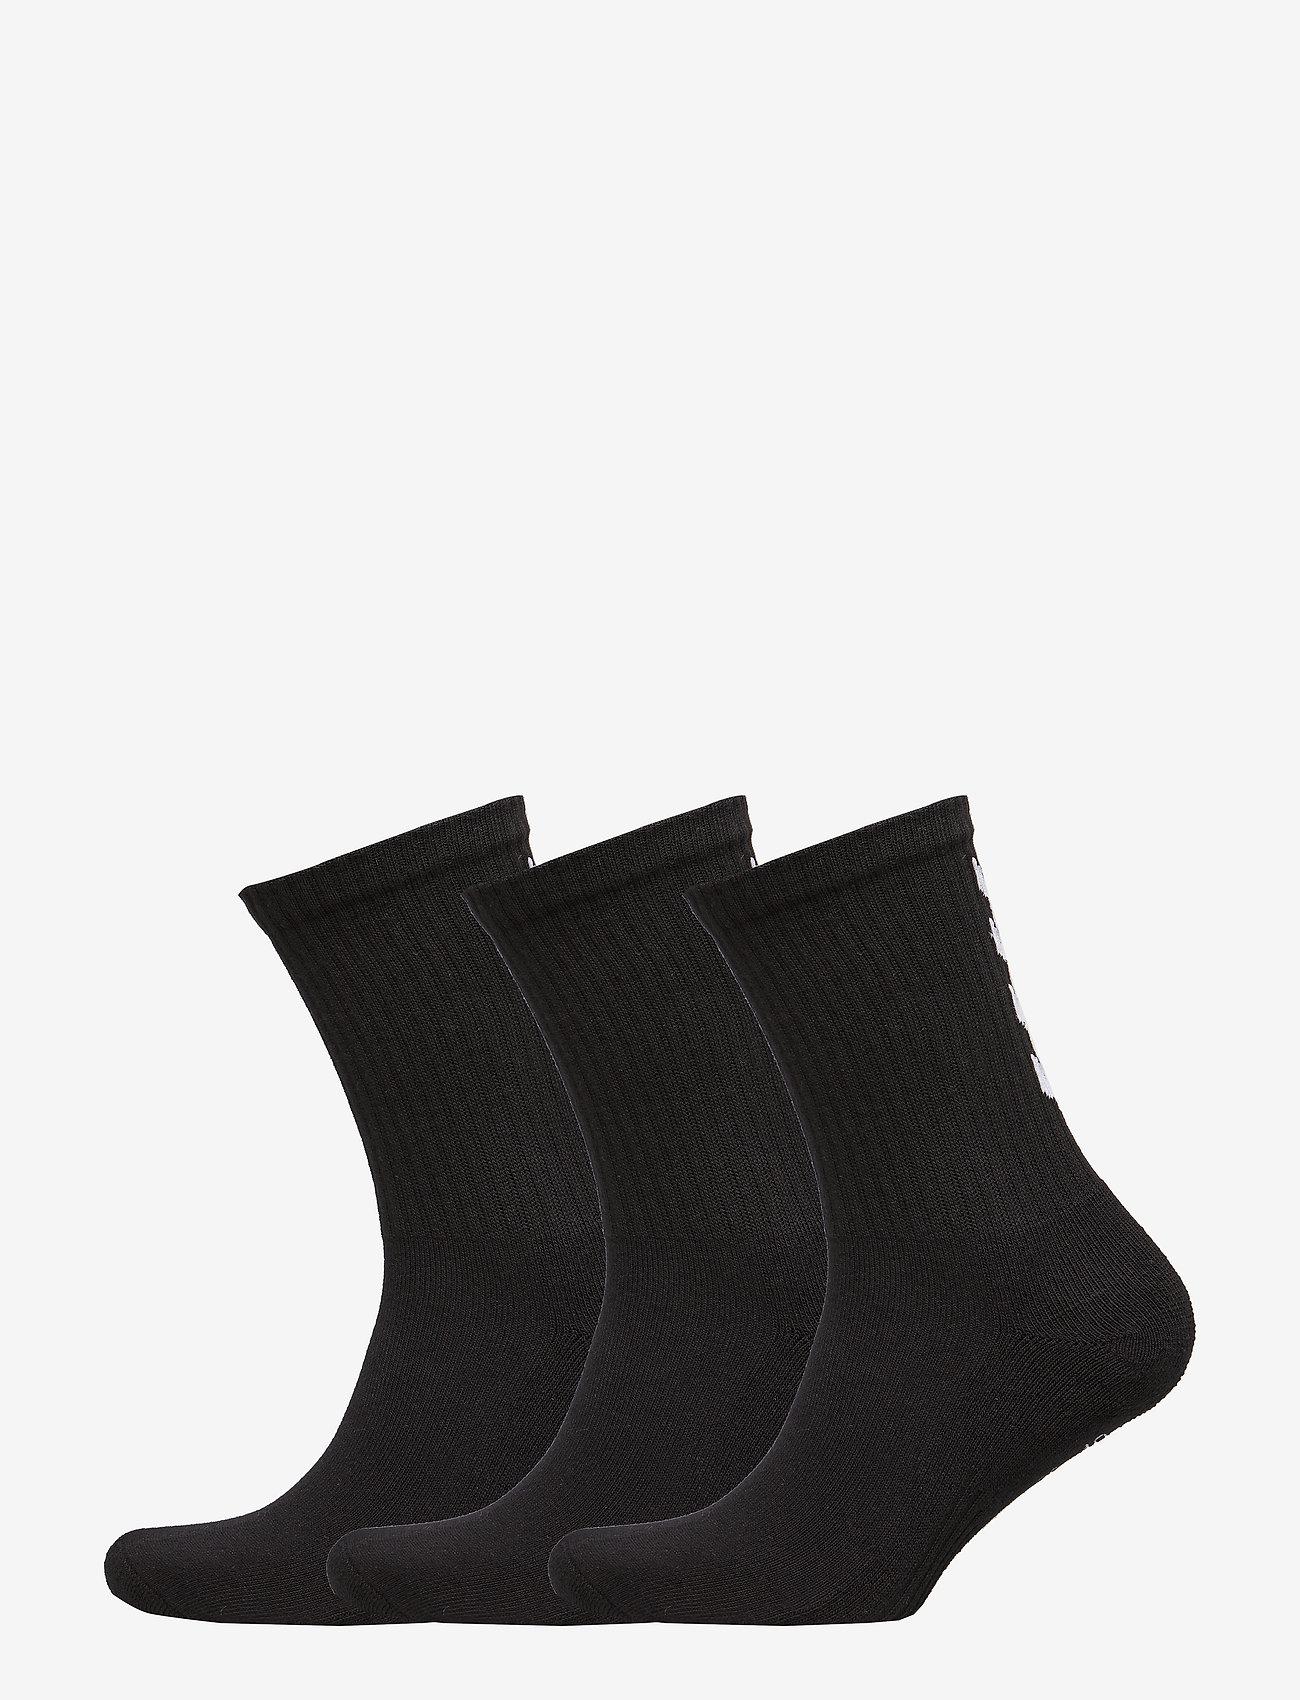 Hummel - FUNDAMENTAL 3-PACK SOCK - sokker - black - 0